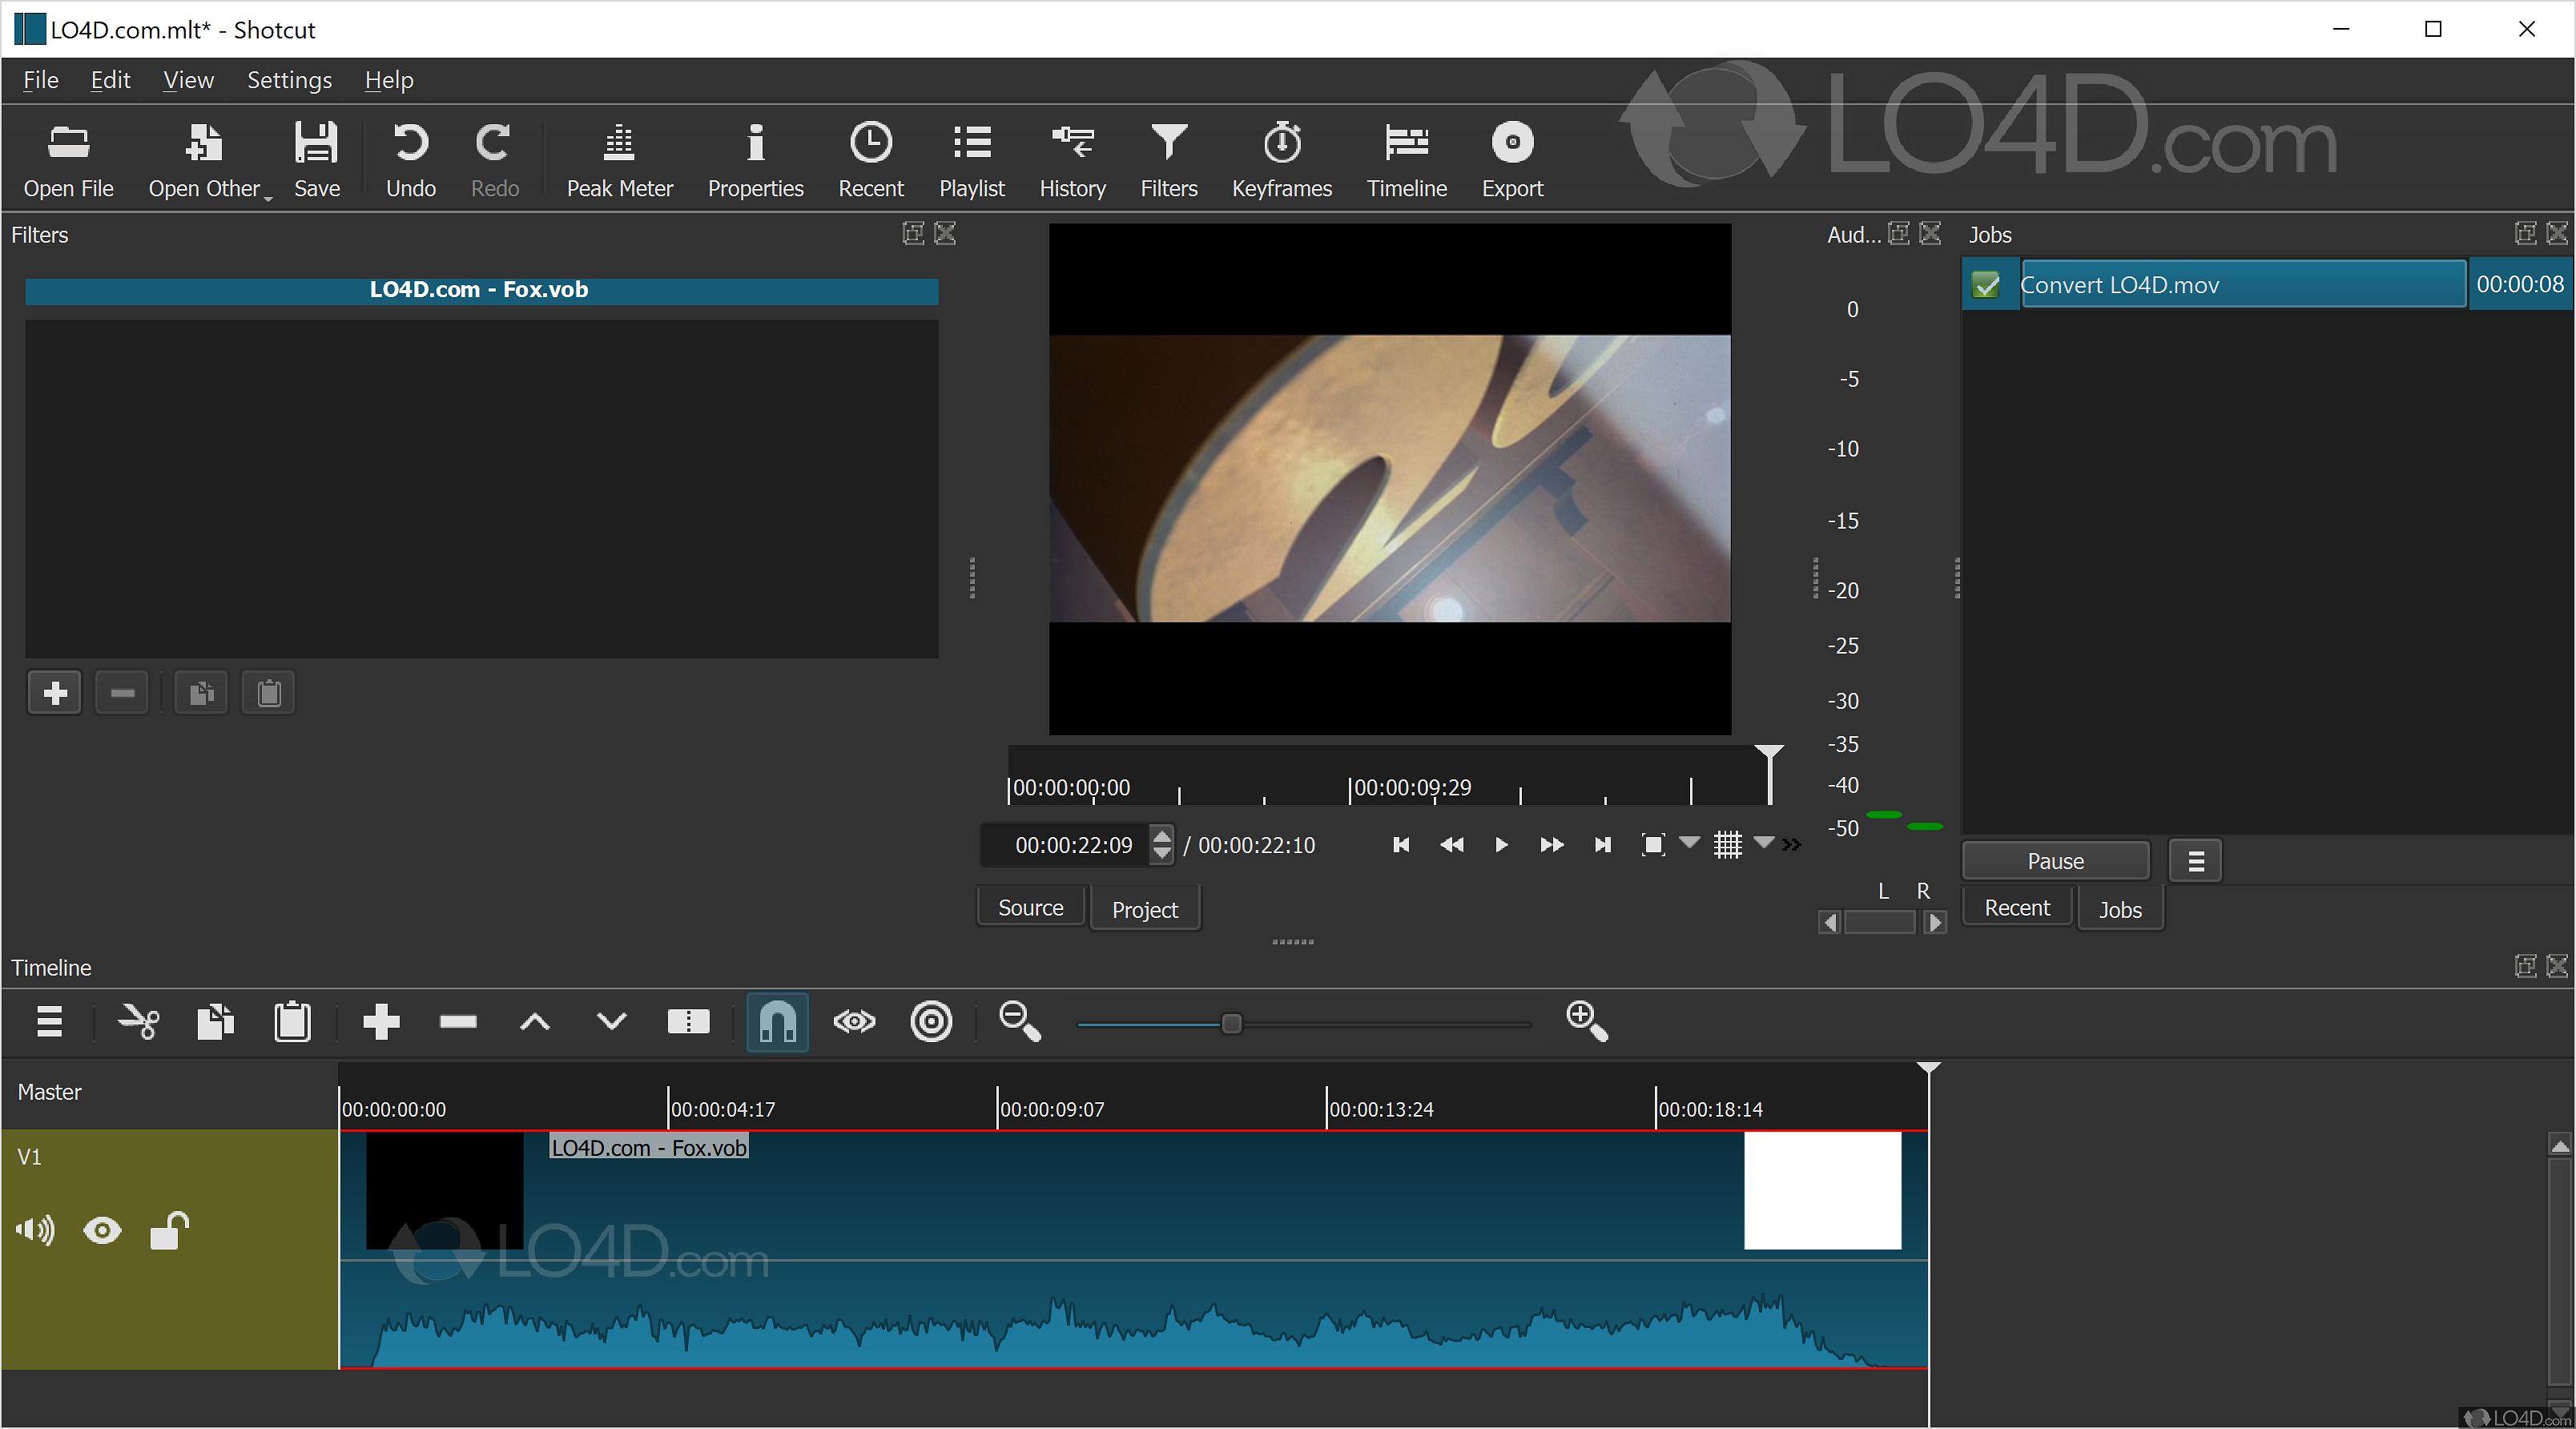 Shotcut Video Editor - Screenshots